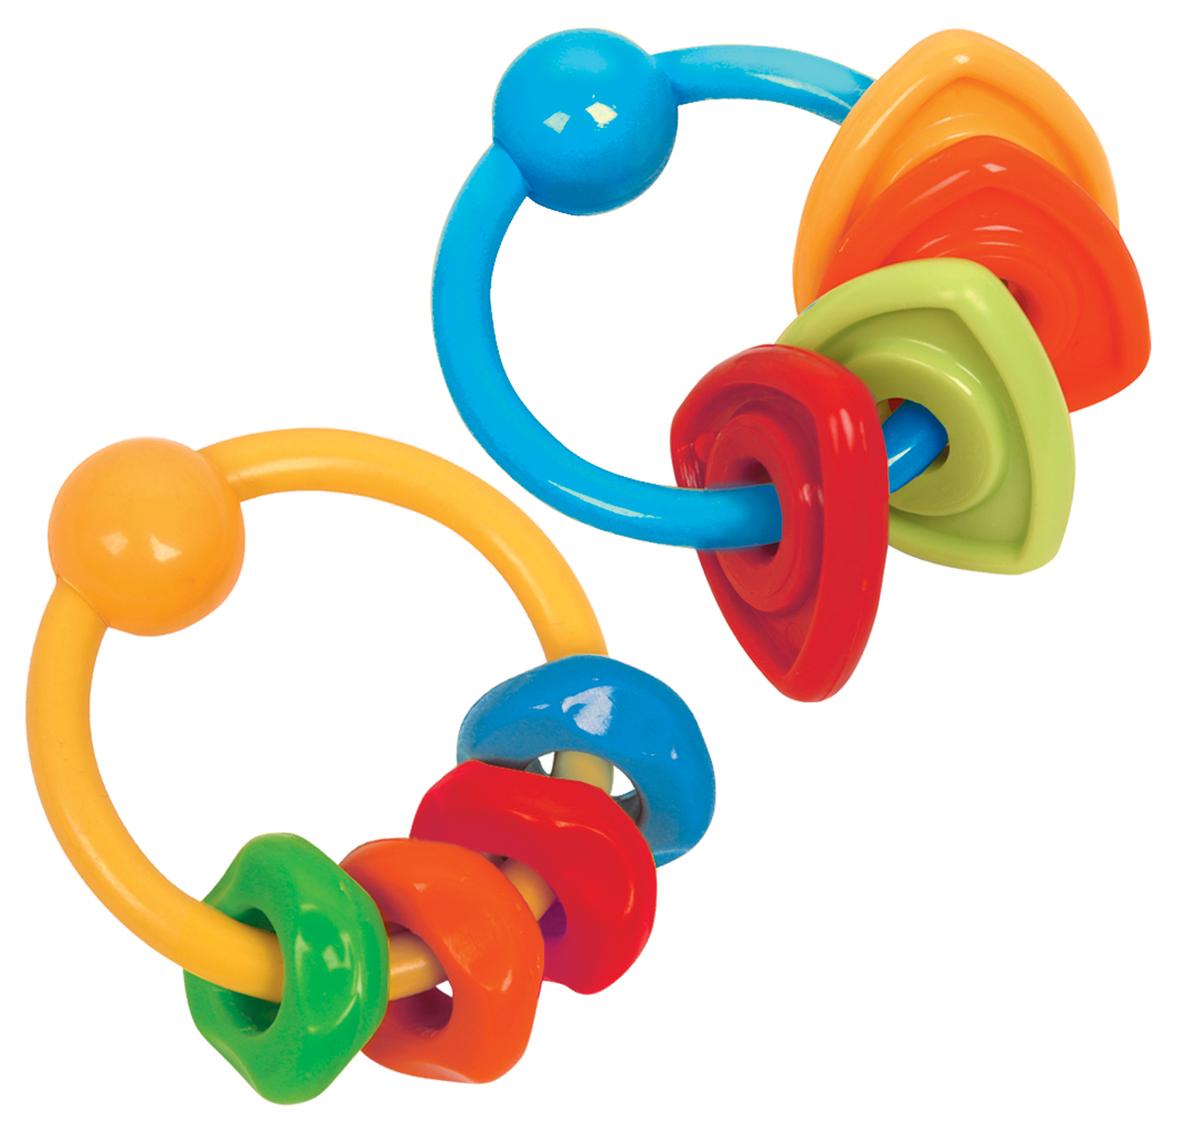 Игрушка-погремушка Мир детства Считалки игрушка погремушка мир детства фокусник зайка